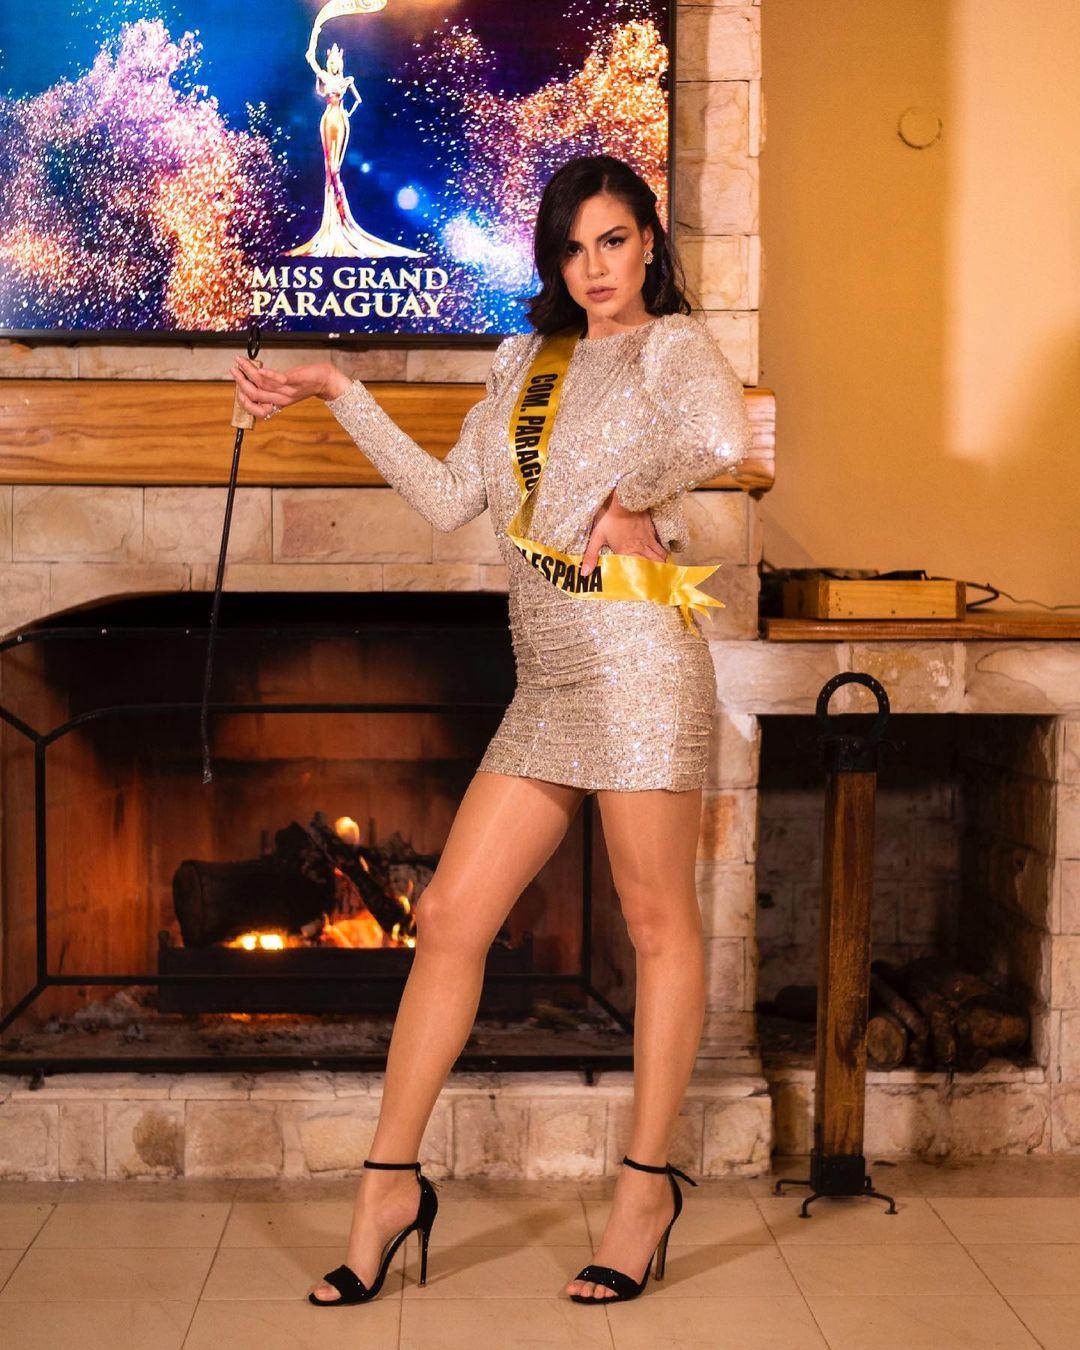 candidatas a miss grand paraguay 2021. final: 3 july. - Página 7 OoT6xI